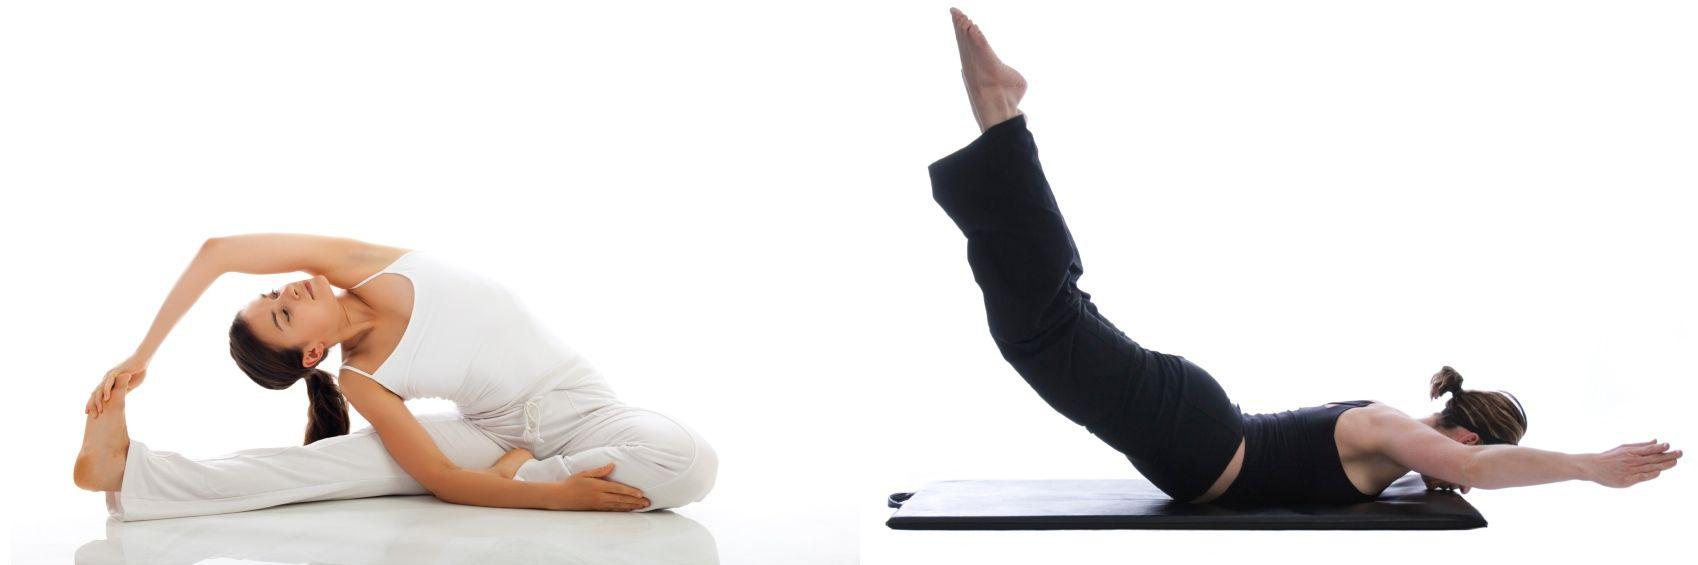 The Breakdown: Yoga vs Pilates